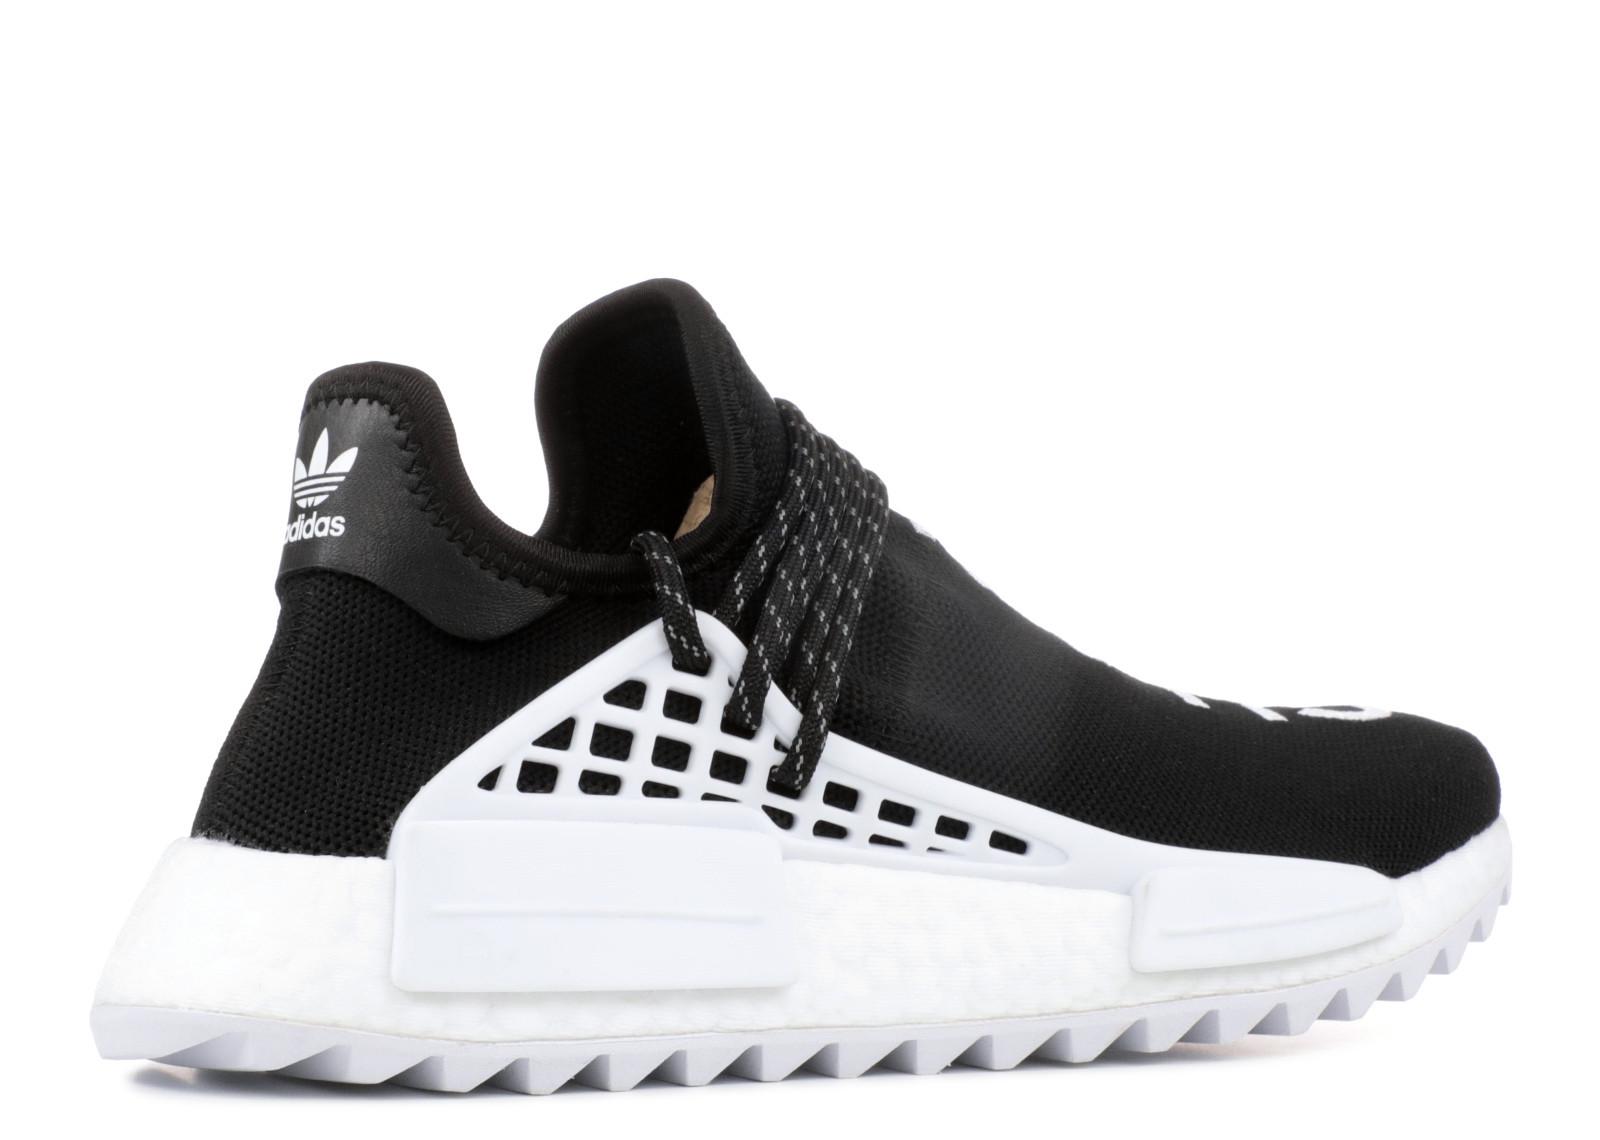 Buy Cheap Adidas Chanel x Pharrell x NMD Human Race Shoes Fake